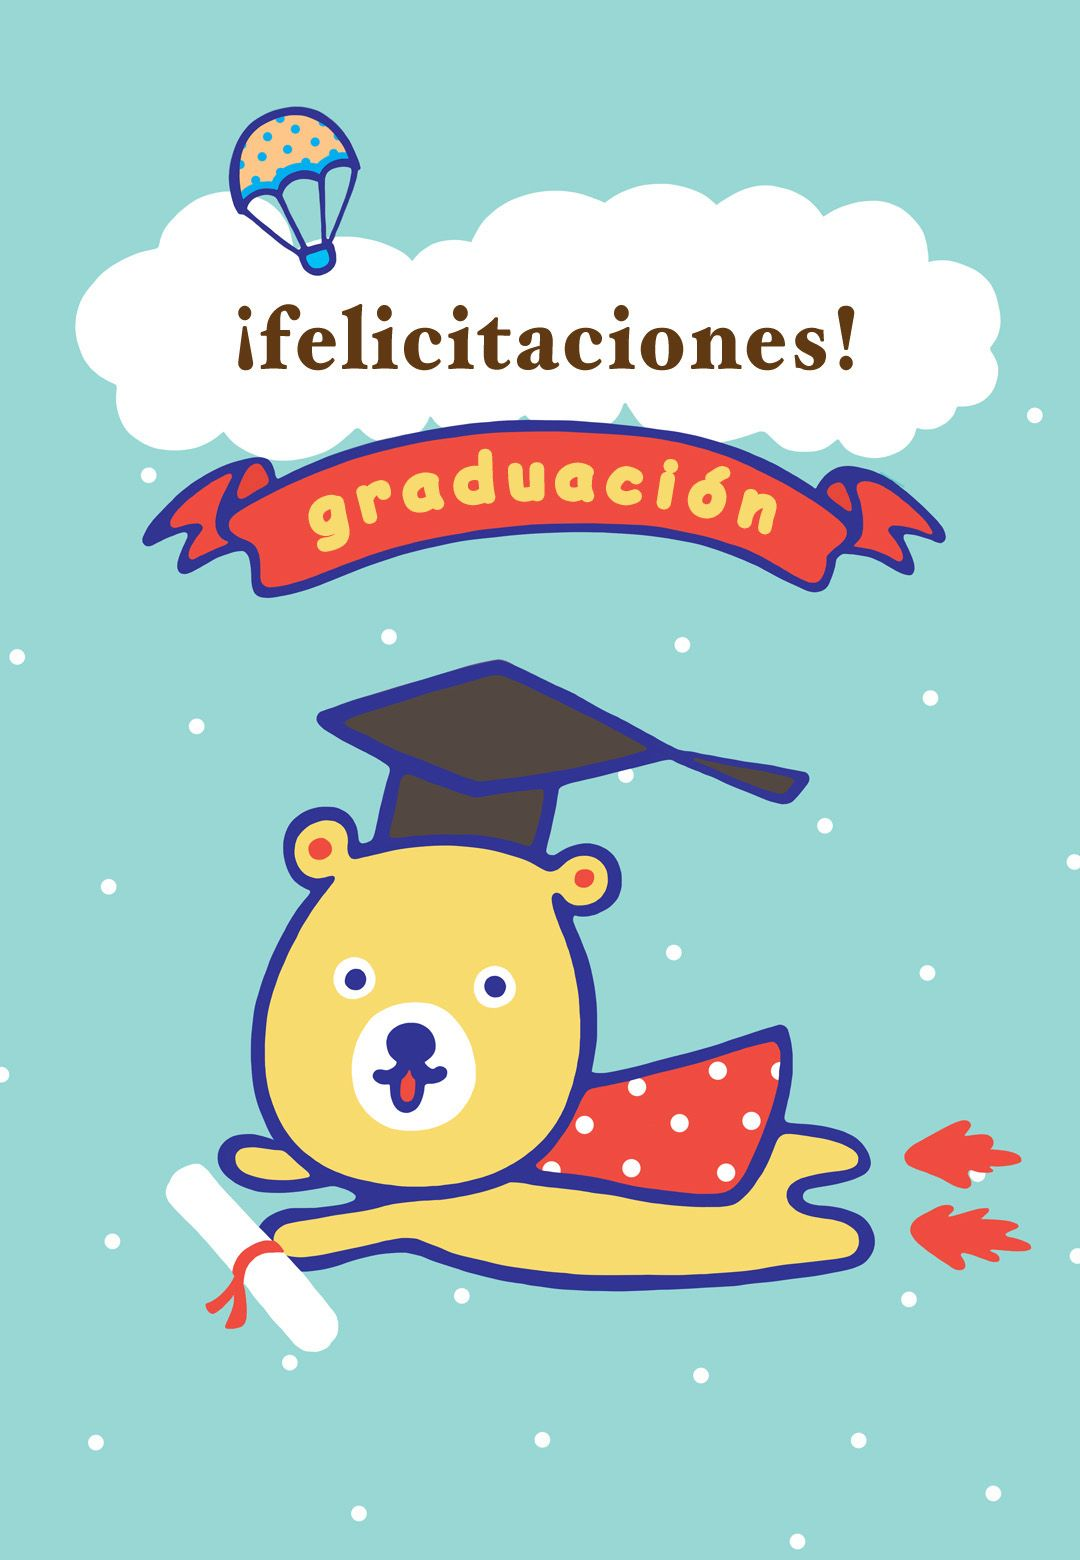 Tarjeta Gratis De Felicitaciones Para Imprimir Felicitaciones Graduacion Greetings Island Felicitaciones Graduacion Felicitaciones Tarjetas Gratis